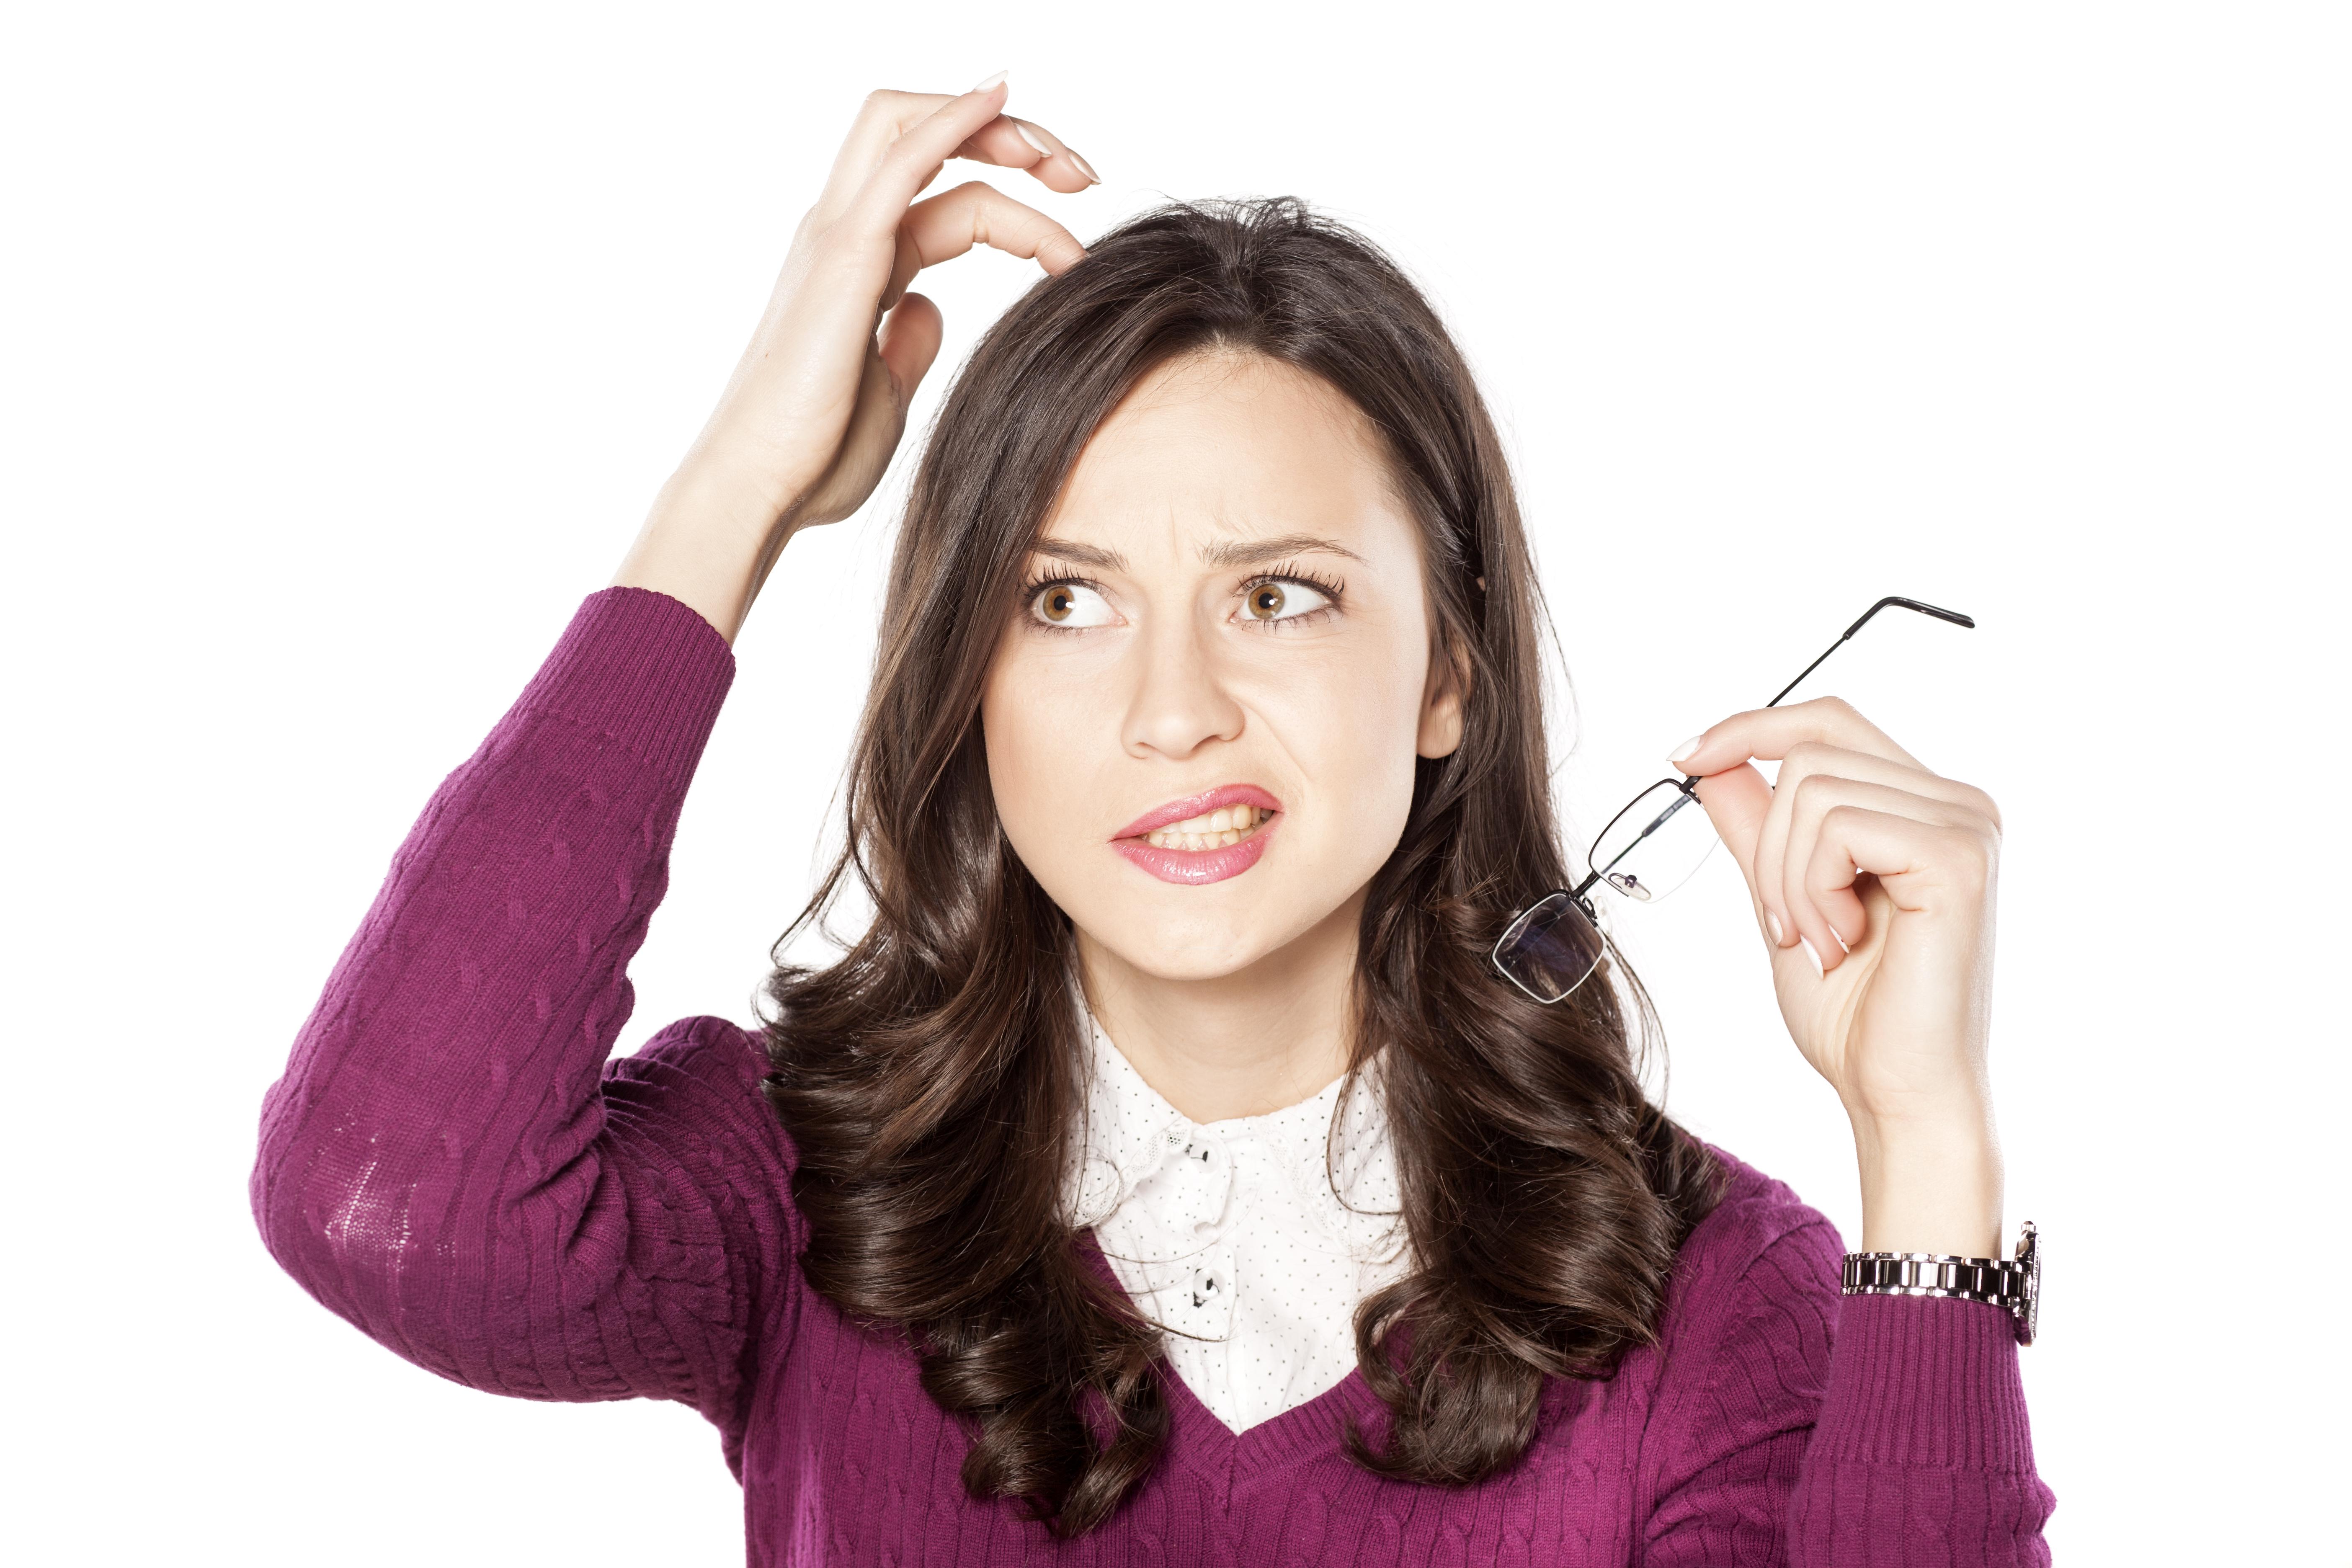 AdobeStock_78581941 - business woman scratching head